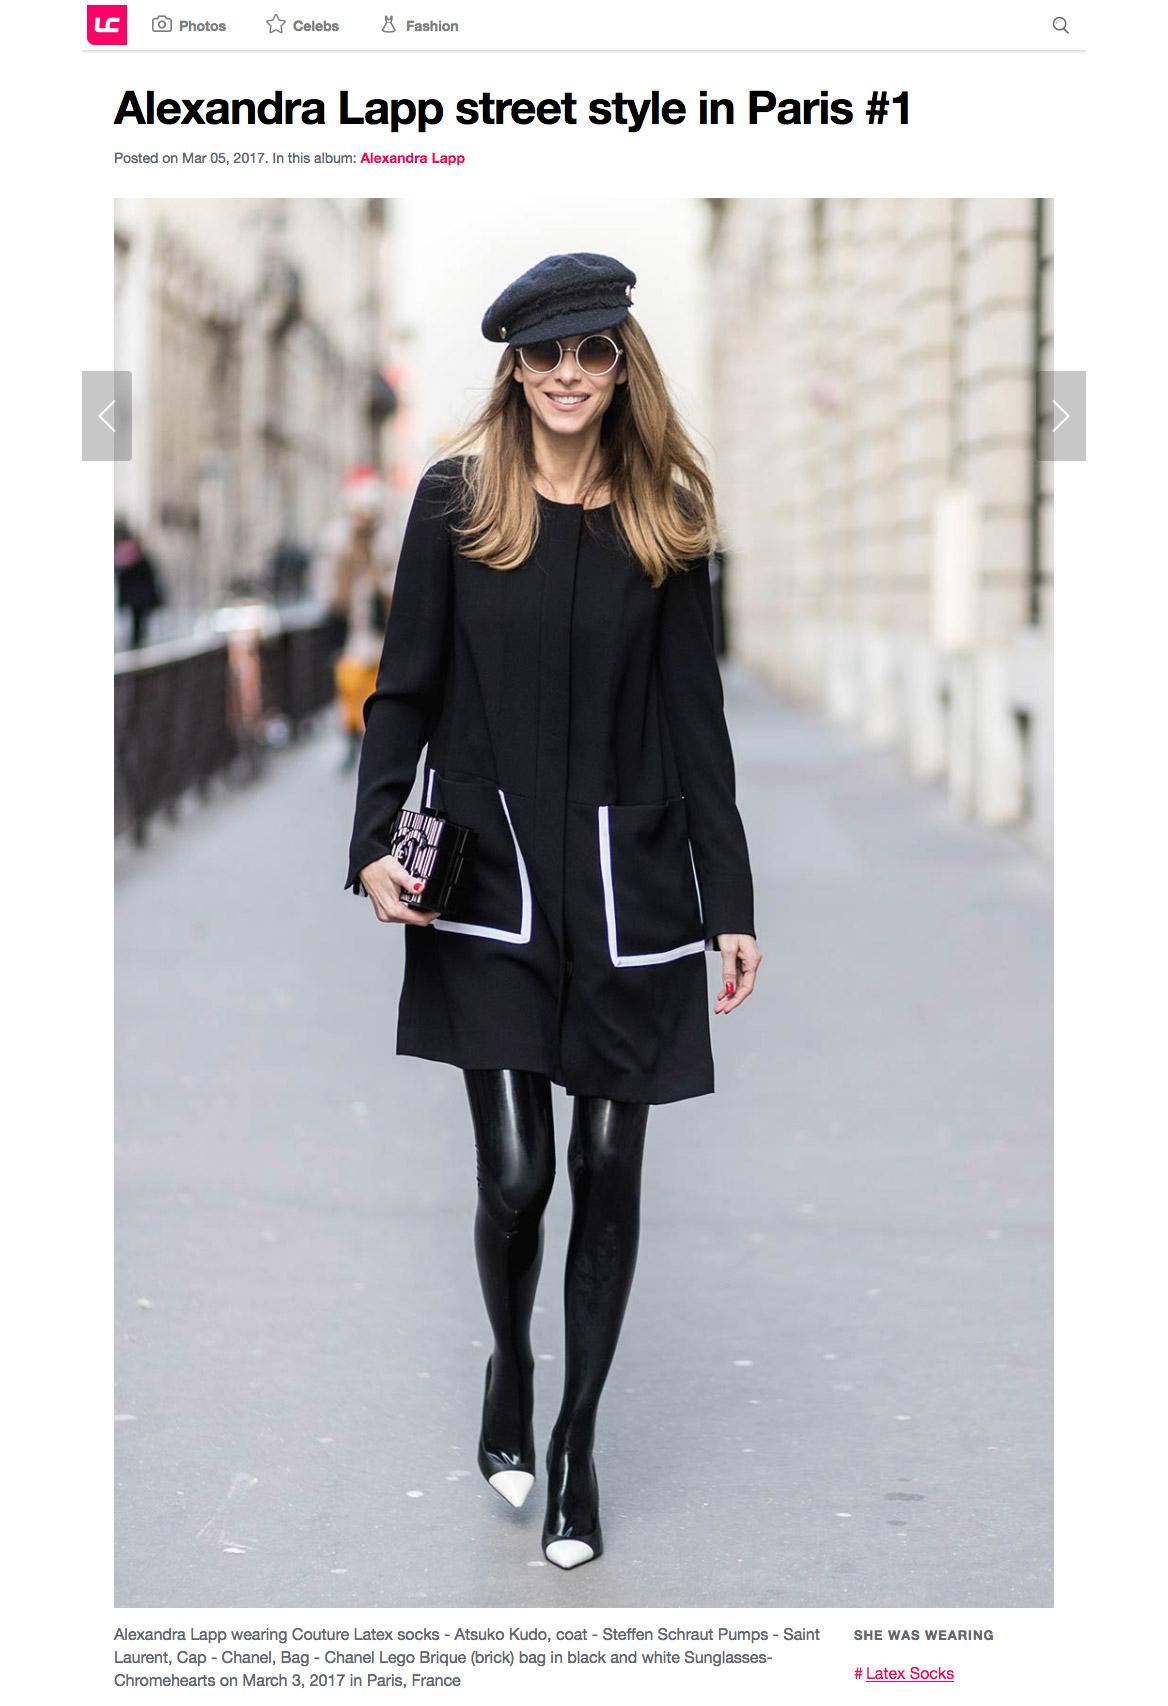 Alexandra Lapp street style in Paris 1 - Leather Celebrities - 2017 03 - found on http://www.leathercelebrities.com/photos/entry/alexandra-lapp-street-style-in-paris-1/